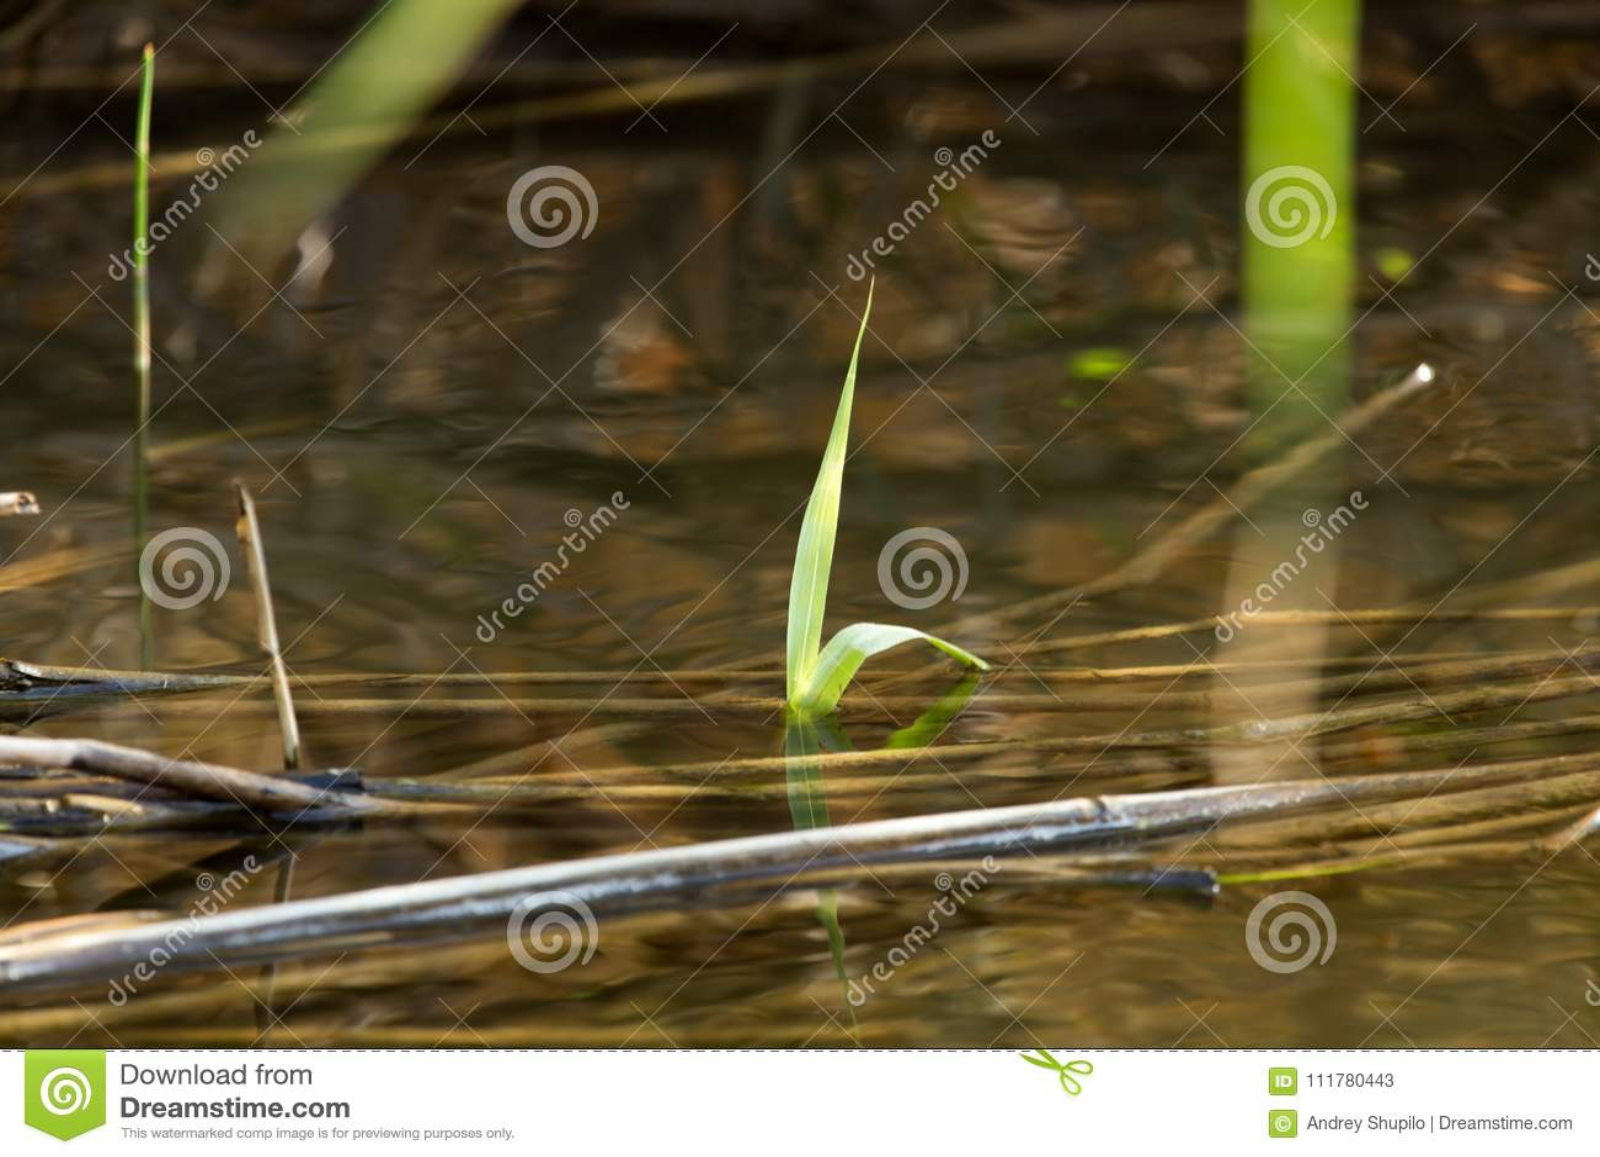 Leaves of reeds in water